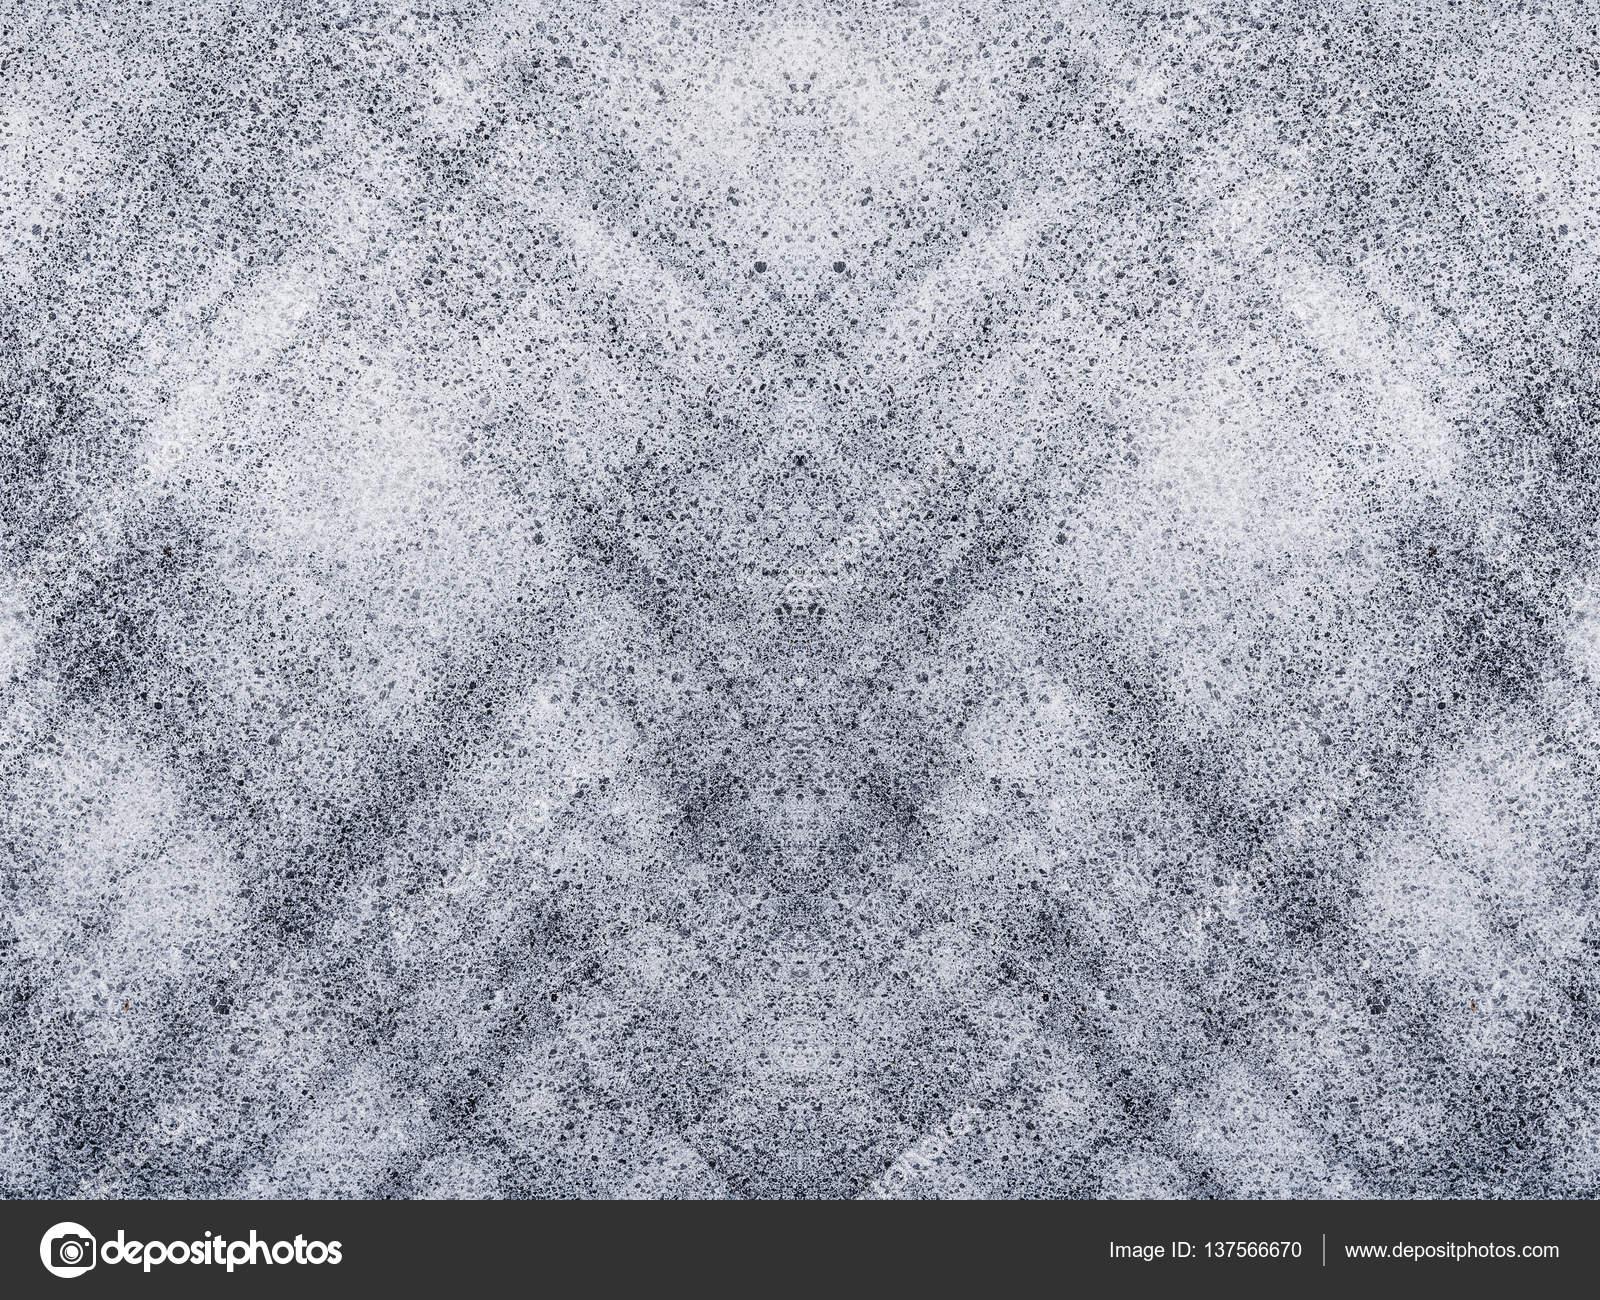 texture marbre fond d 39 cran abstrait photographie tawanlubfah 137566670. Black Bedroom Furniture Sets. Home Design Ideas